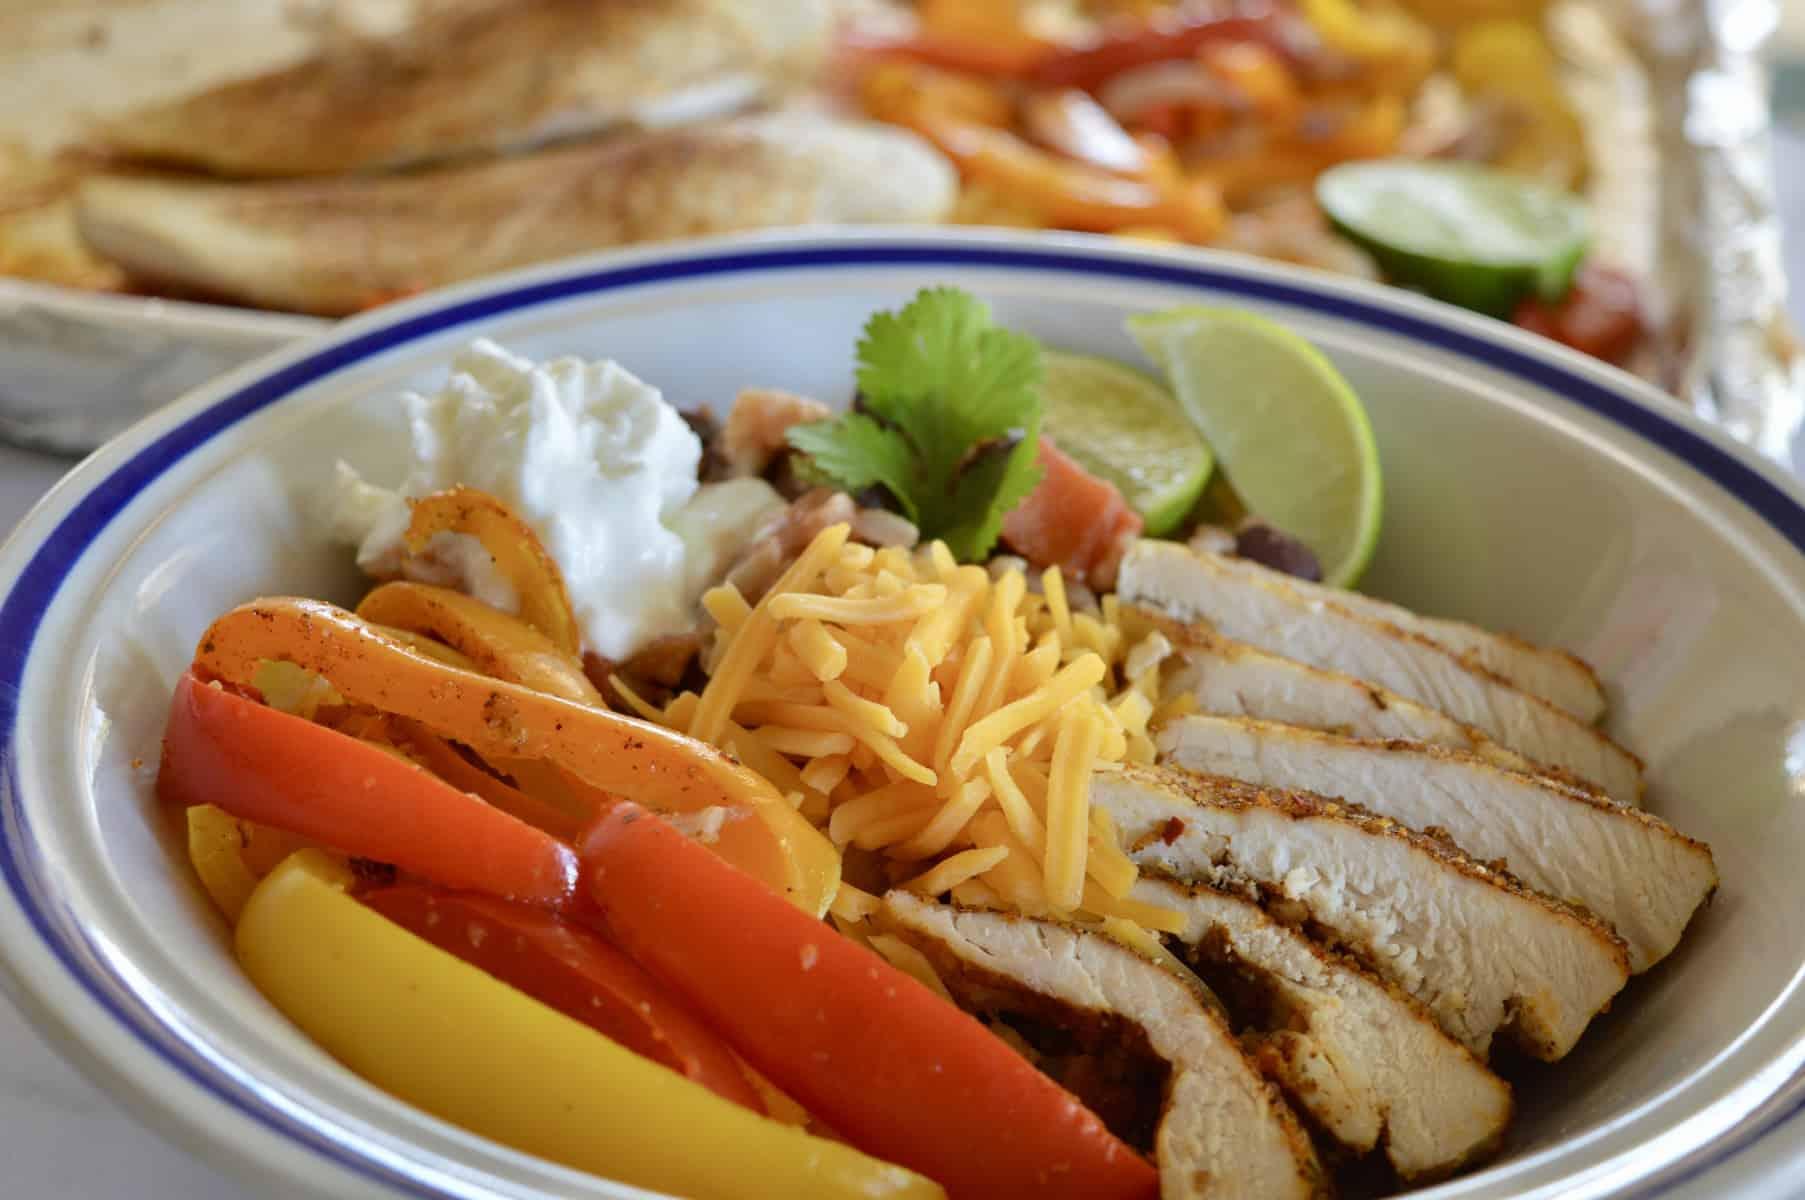 Mexican Chicken Fajita Bowl with sheet pan chicken fajitas.